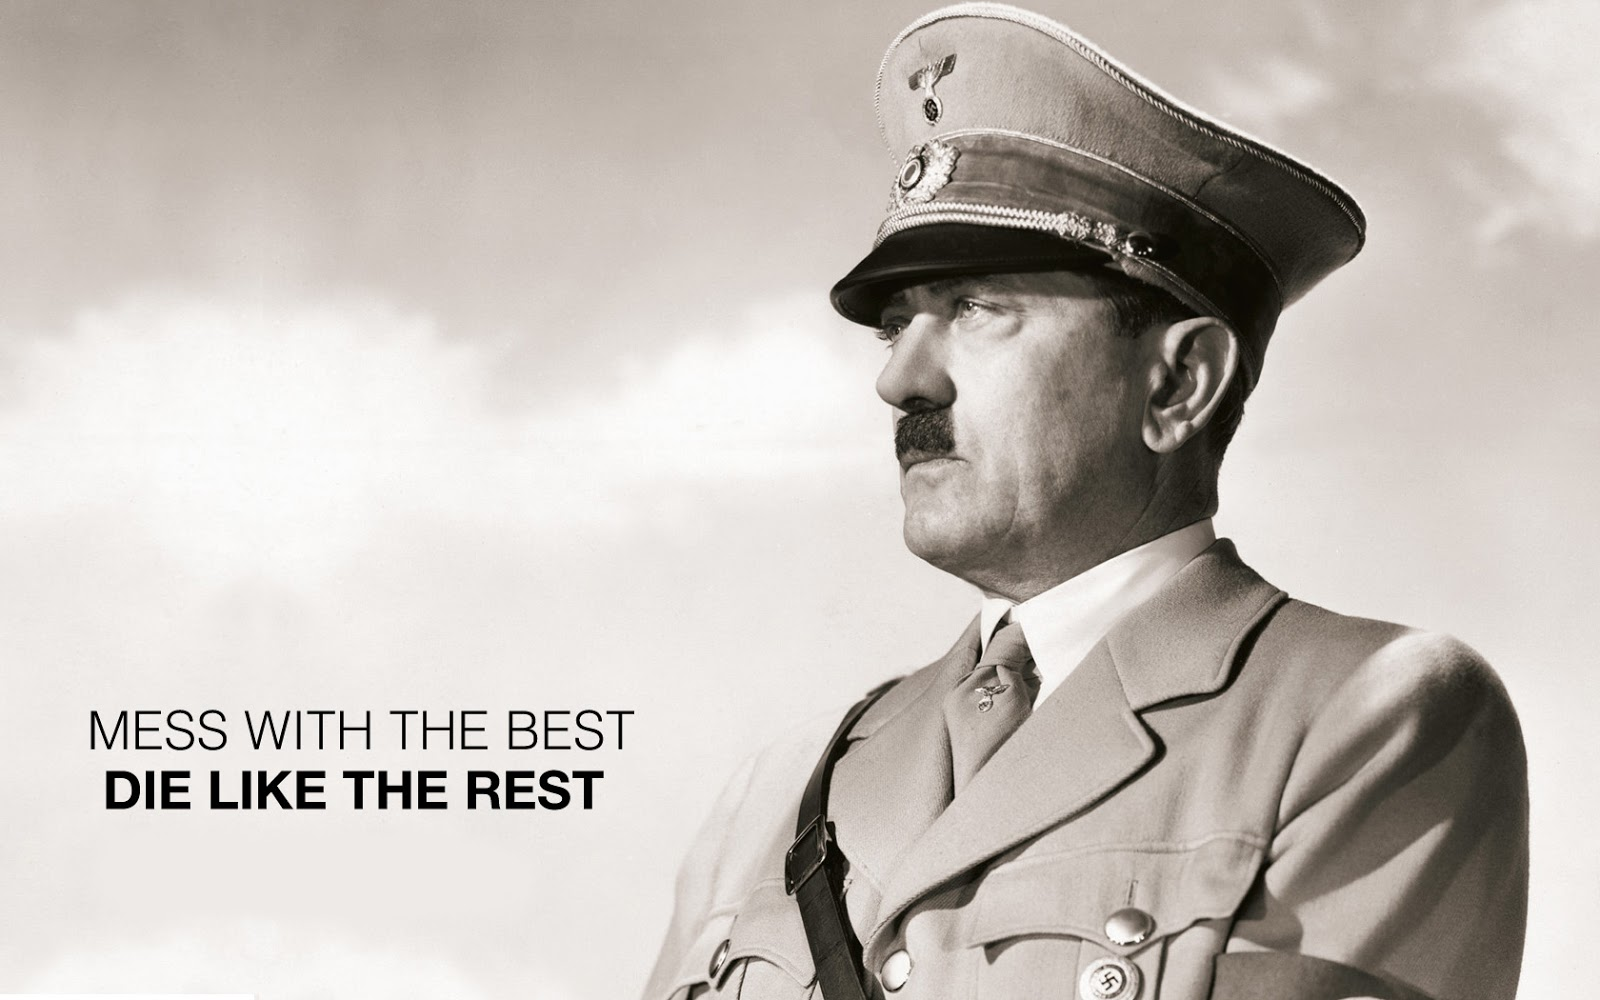 Adolf Hitler Wallpaper: Muhammad Nouman Ali Sheroz Awais Iqbal Talha Mohsin Riaz